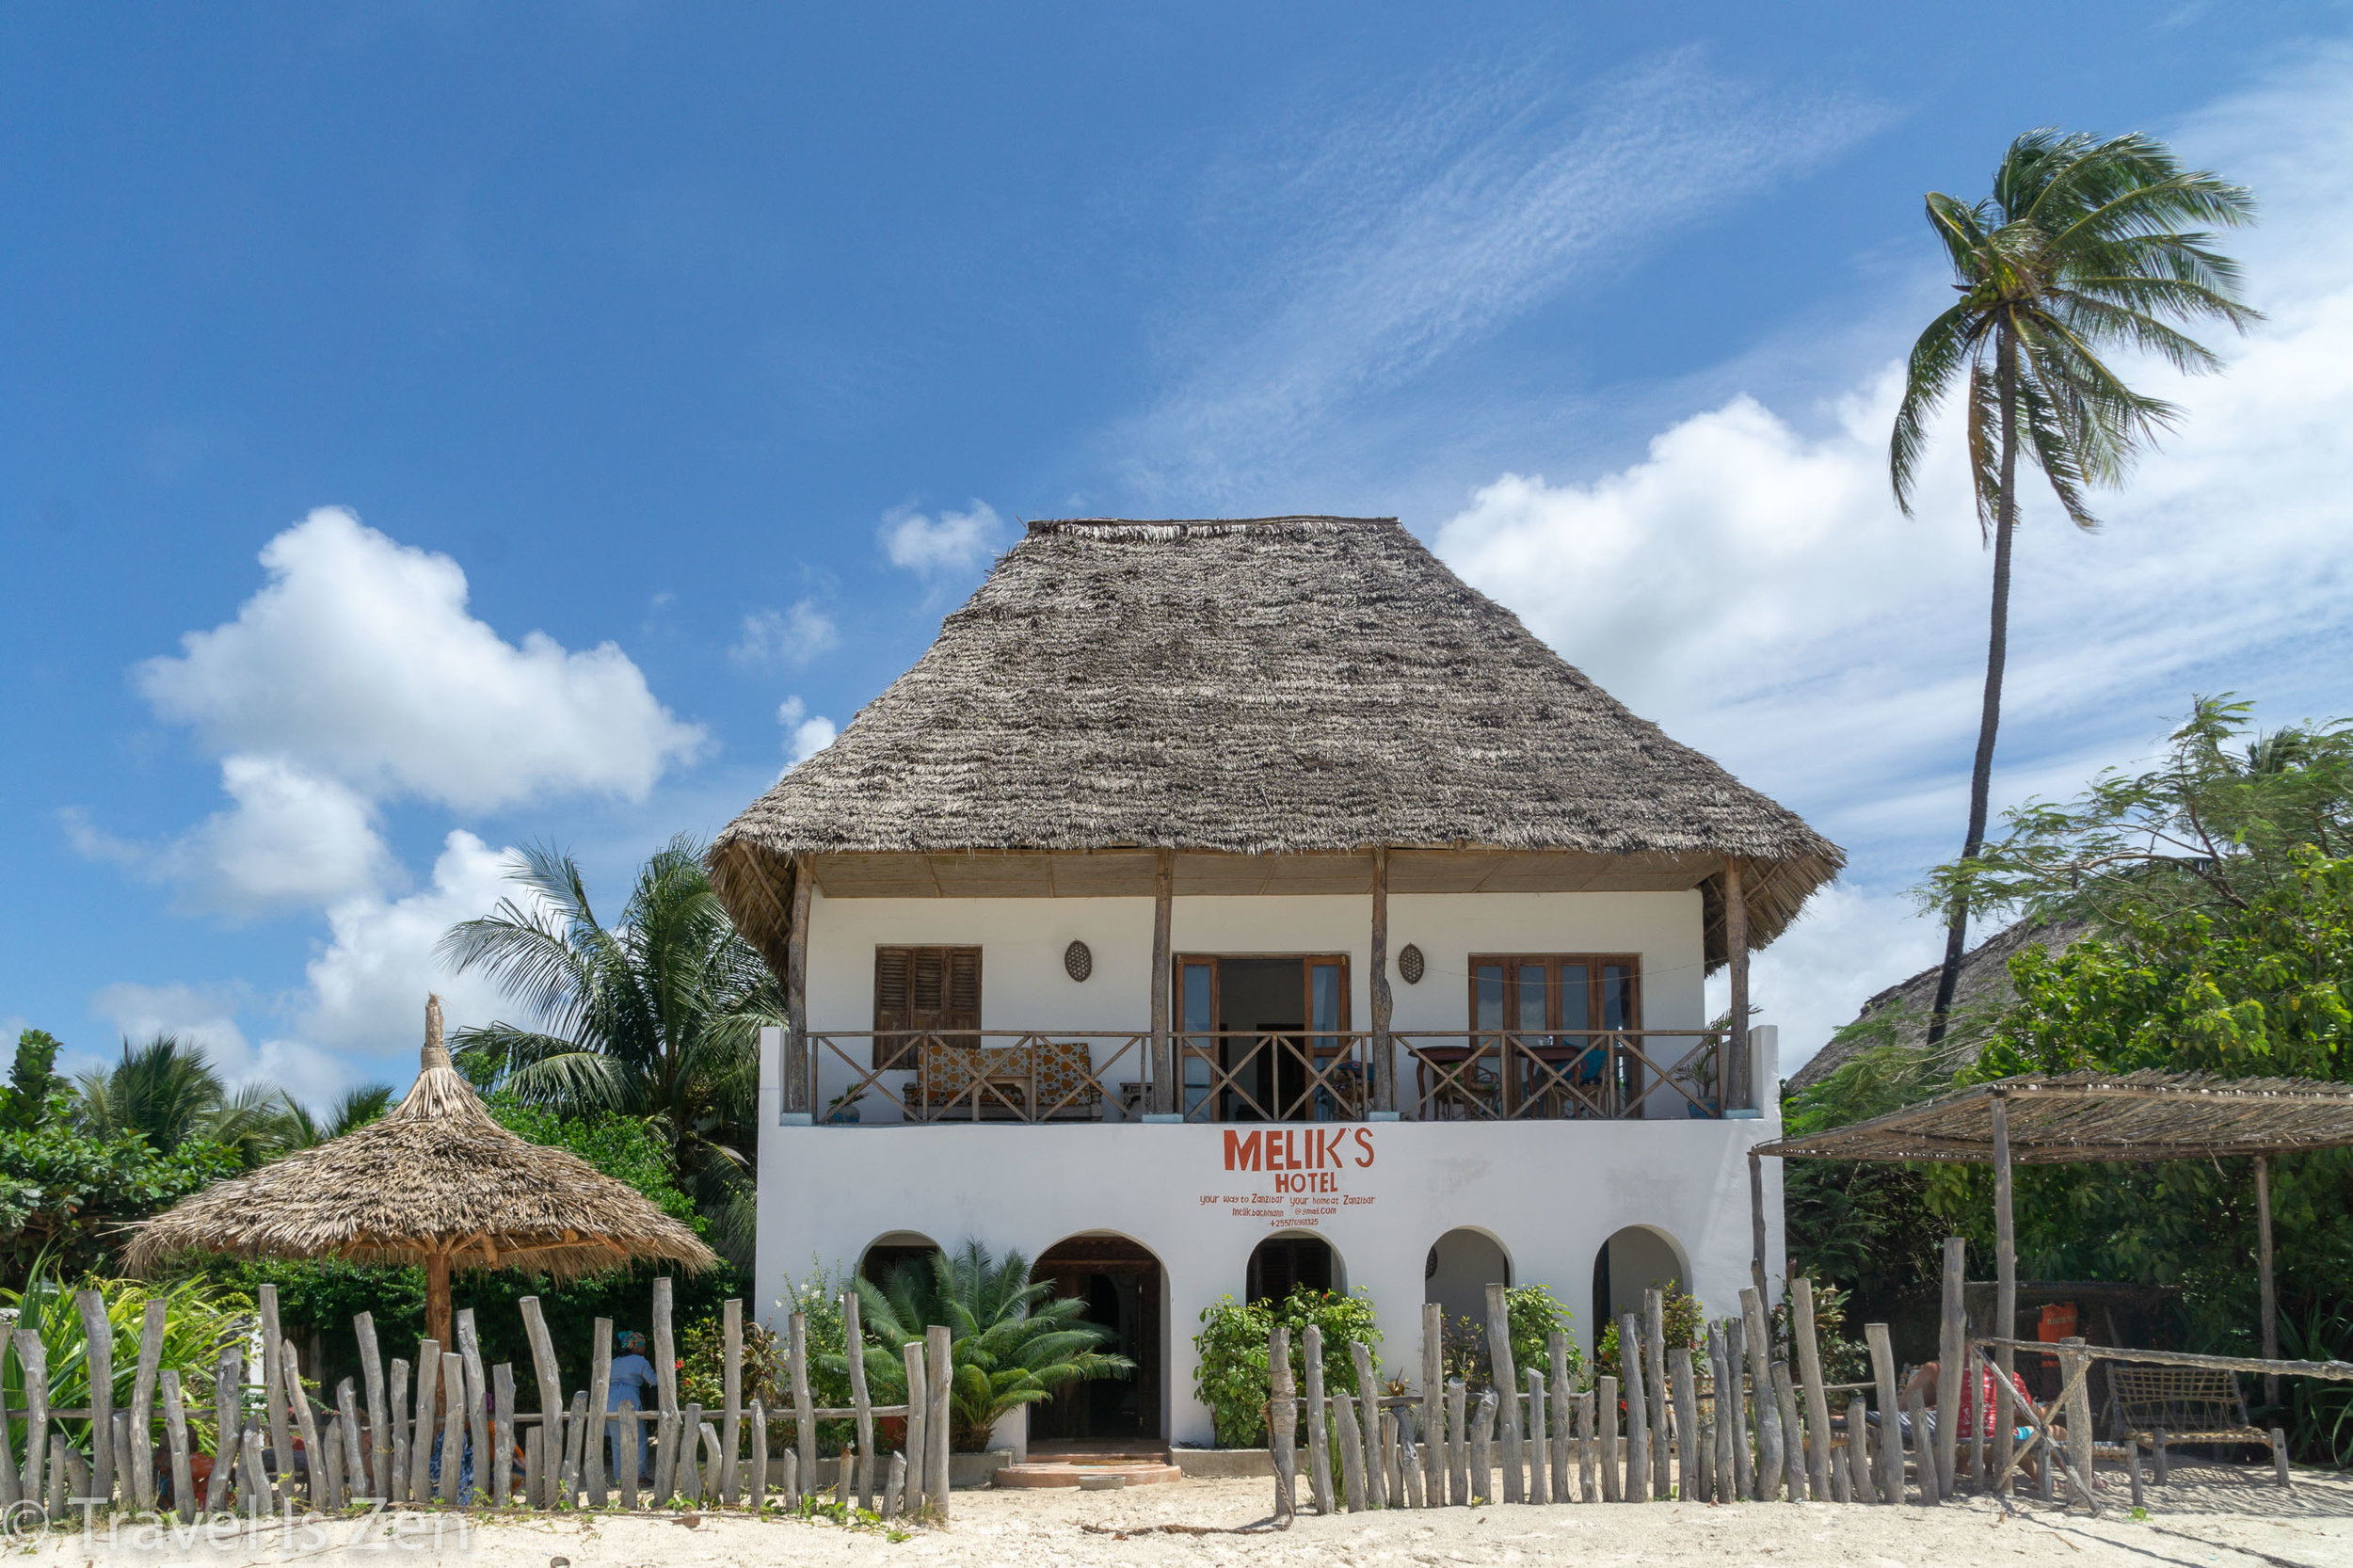 Our island retreat: Melik's hotel